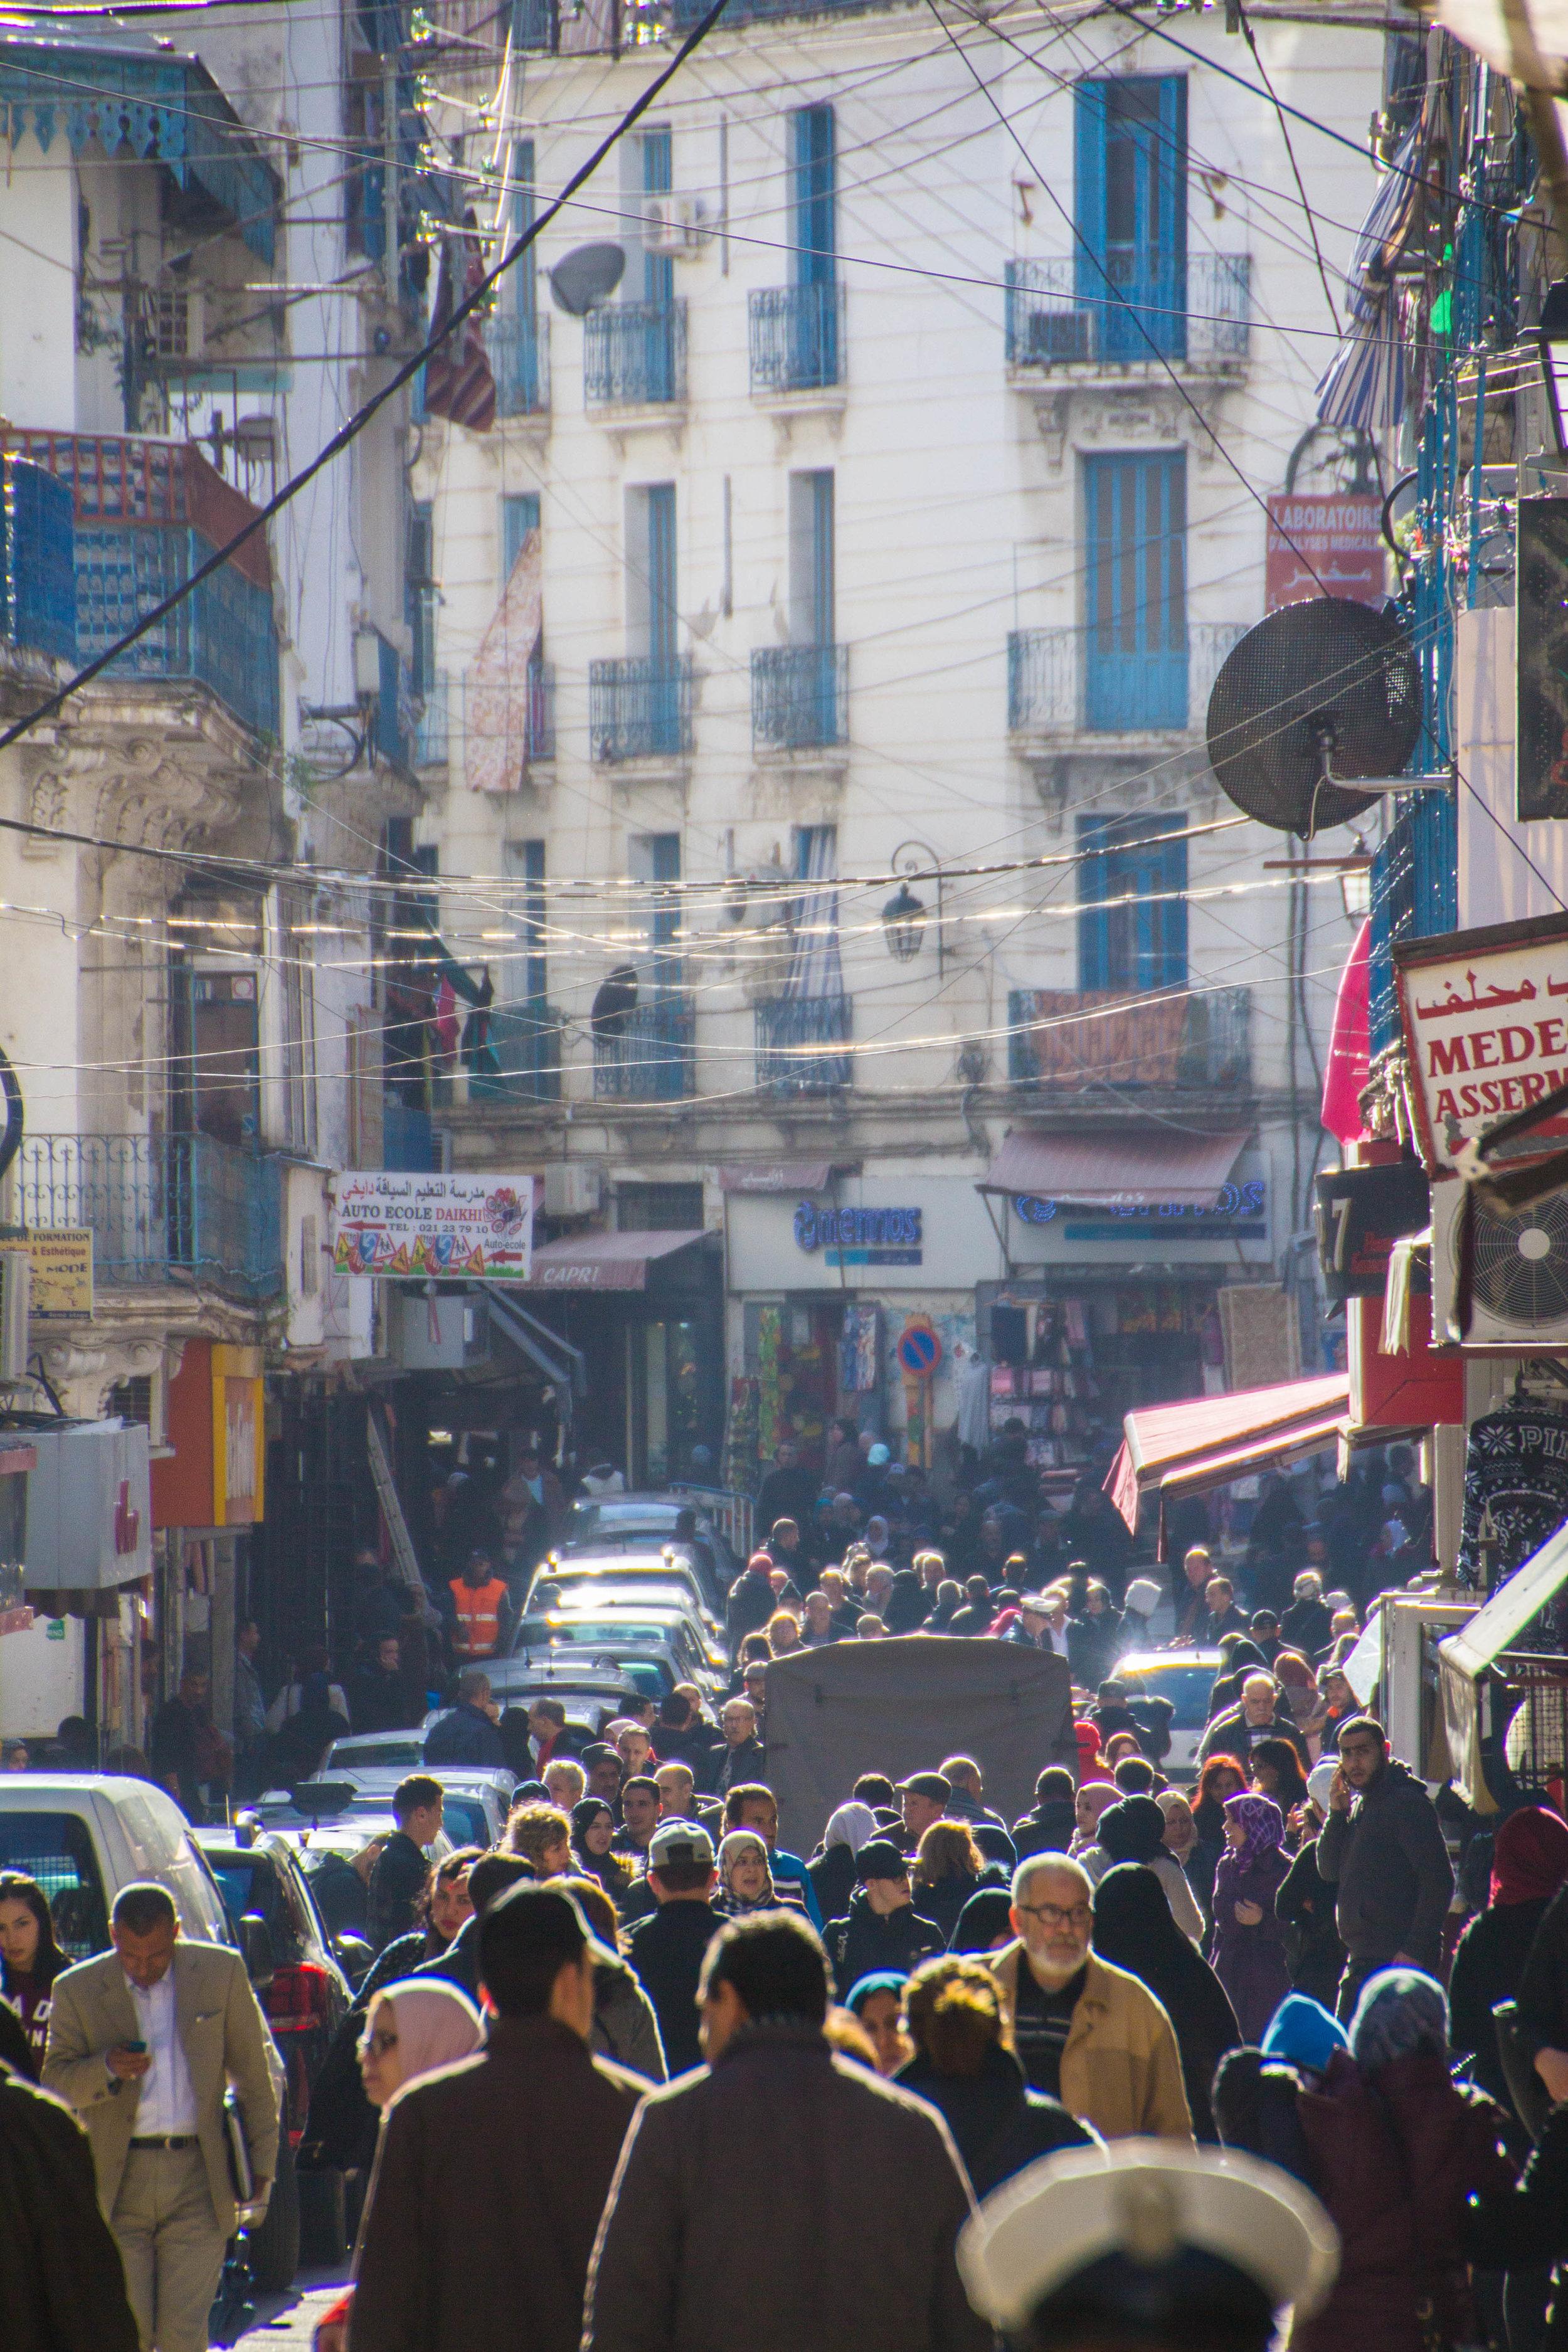 streets-algiers-algeria-30.jpg